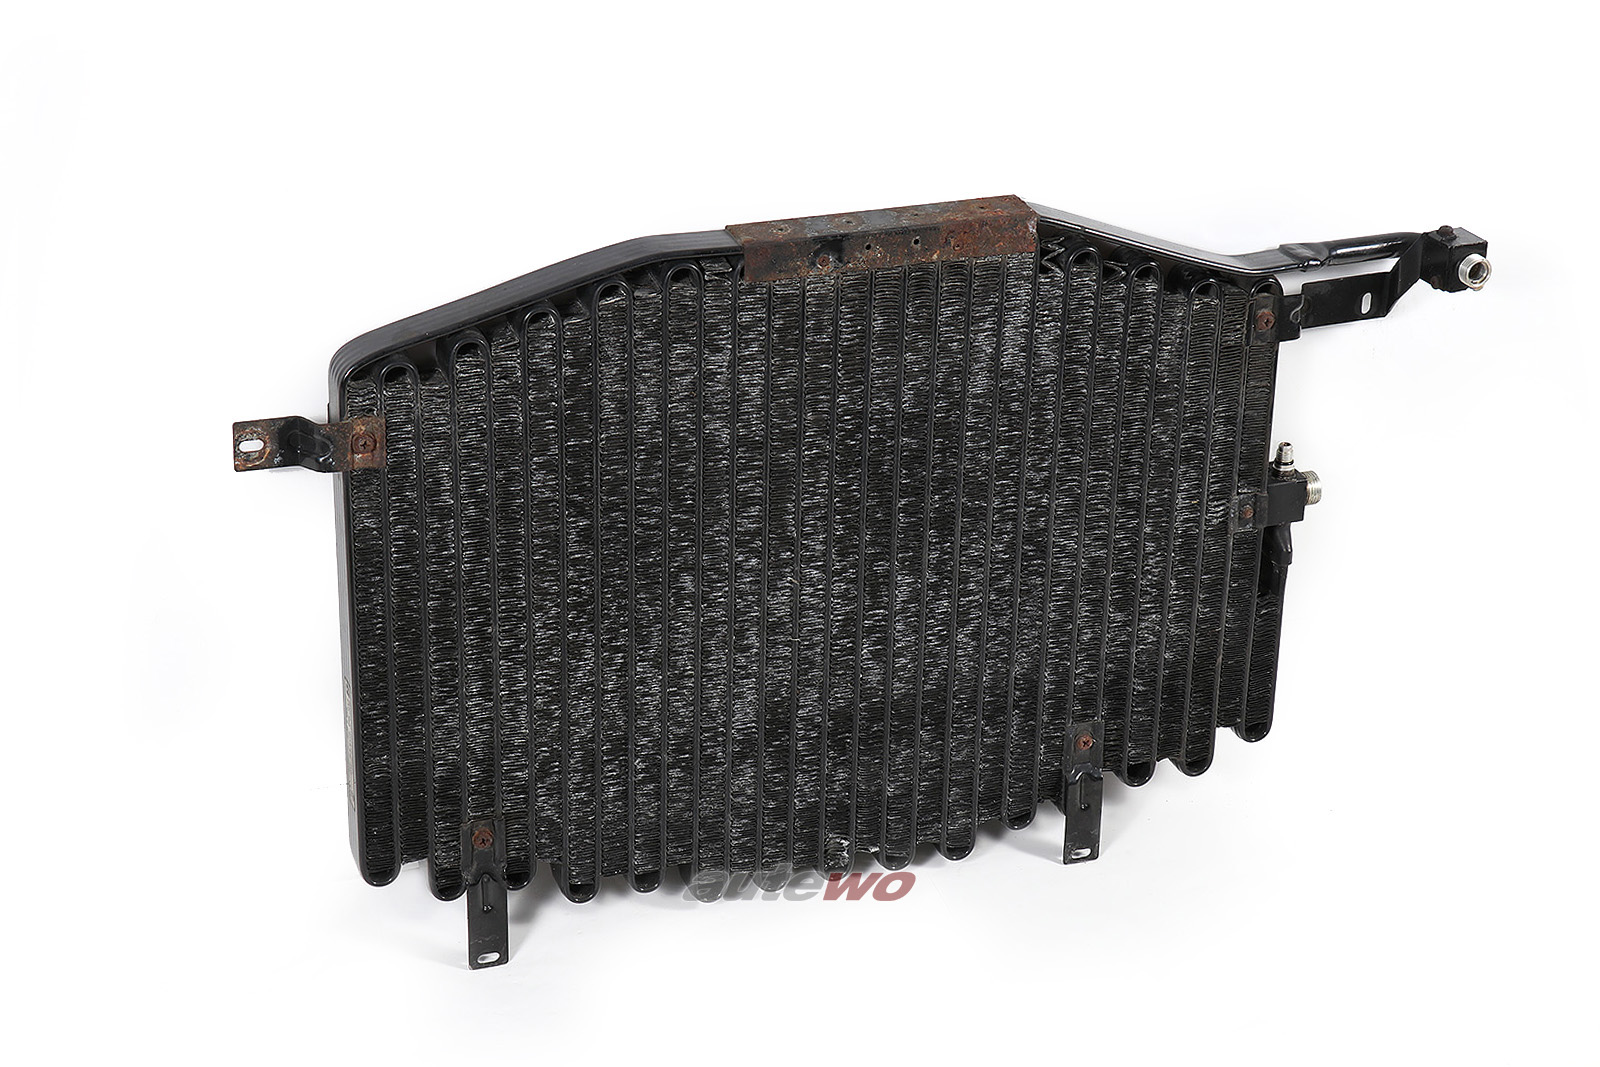 4A0260401A 4A0260403A Audi 100/S4 C4 Klimakondensator R12